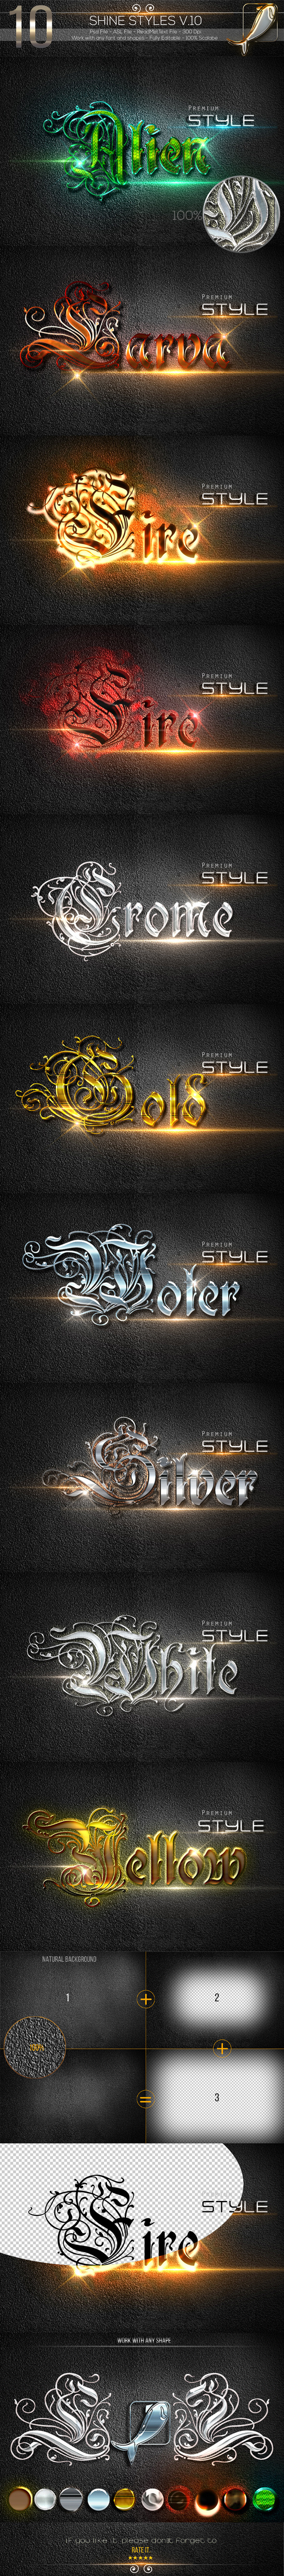 GraphicRiver 10 Shine Styles V.10 10272559